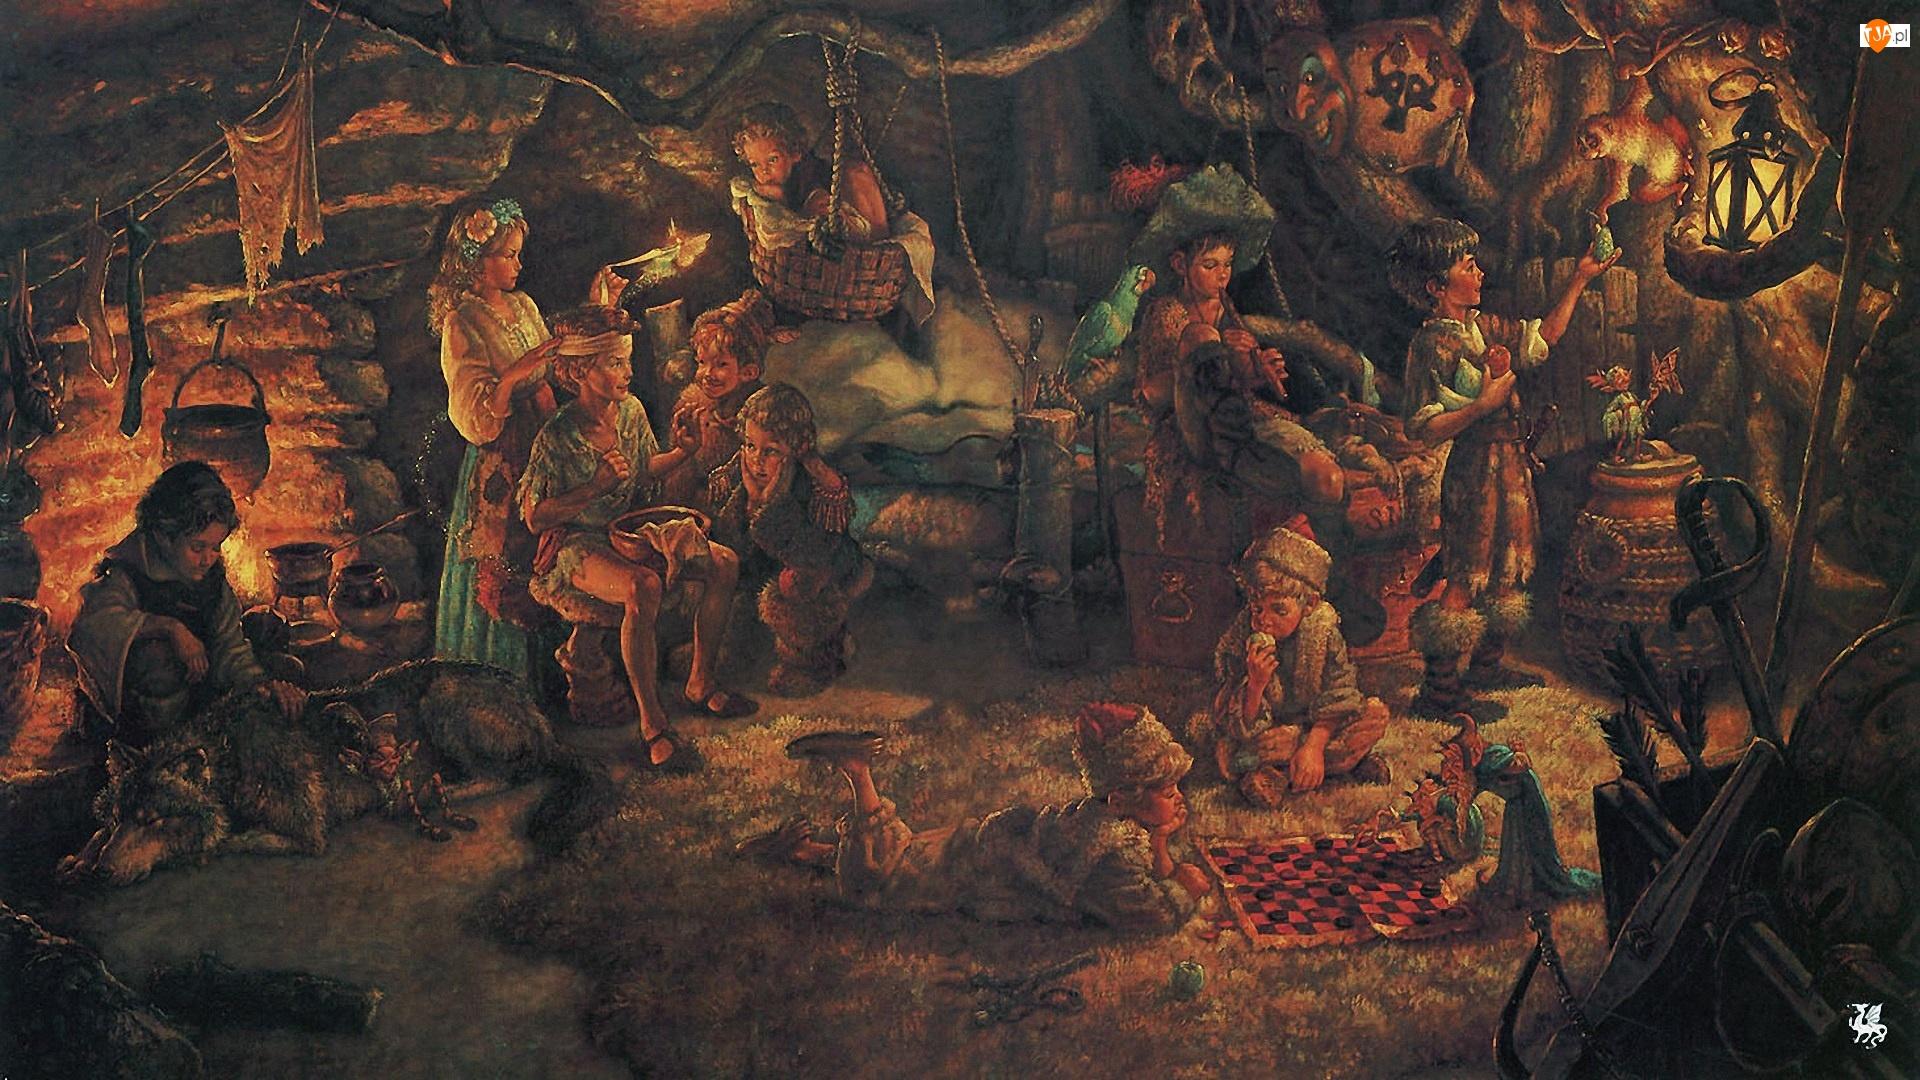 Dzieci, Scott Gustafson, Malarstwo, Piotruś Pan